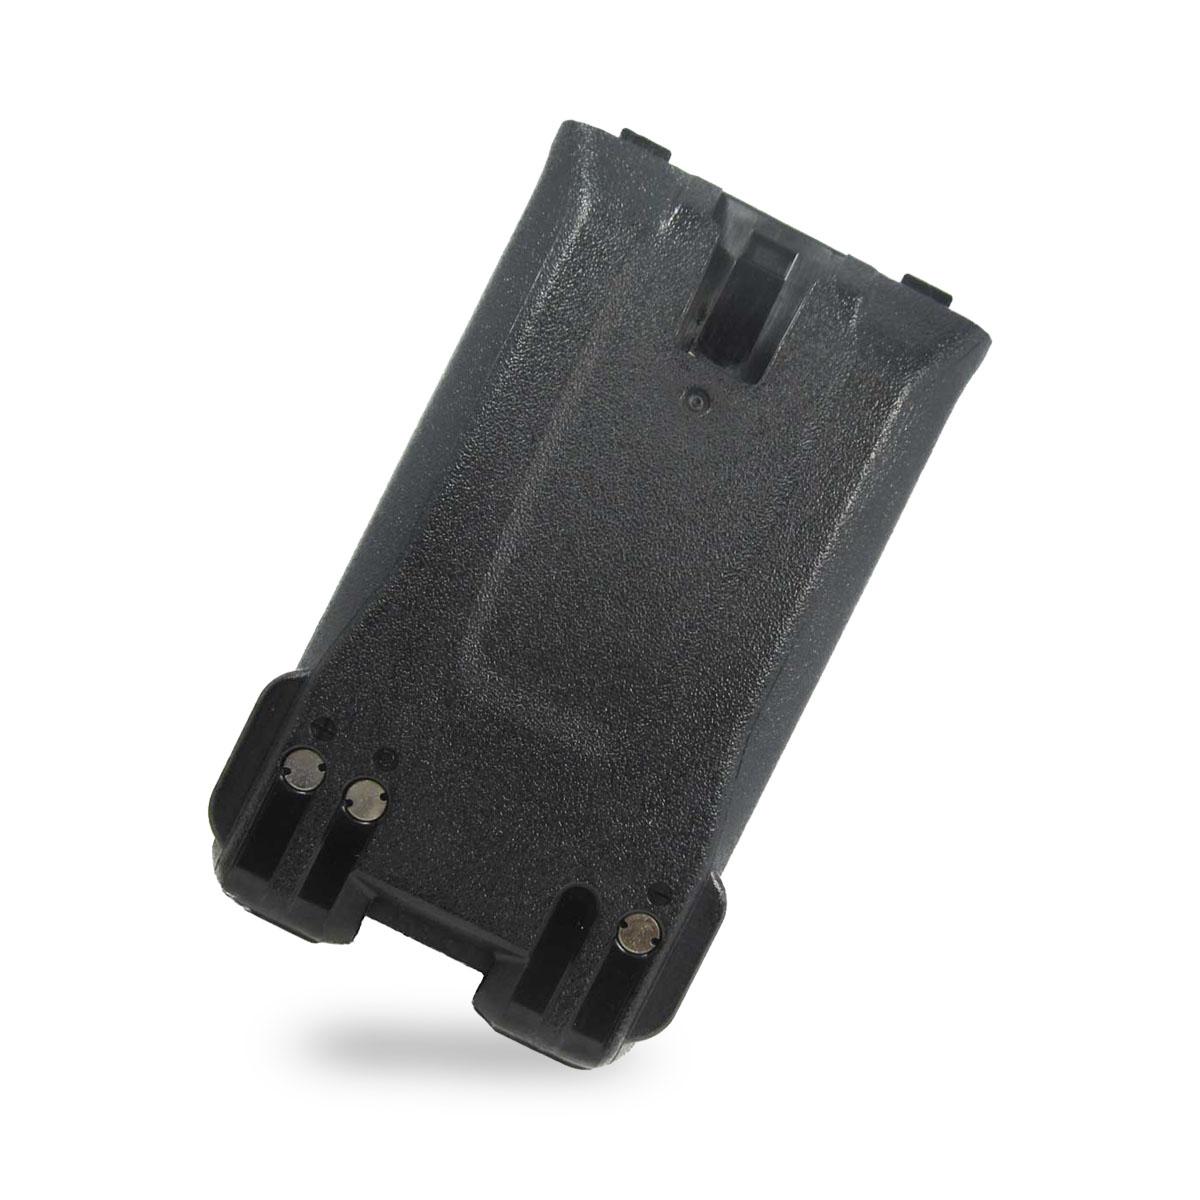 Batería Icom Li-Ion 1900 mAh para radio IC-F3003 y IC-F4003 BP-265